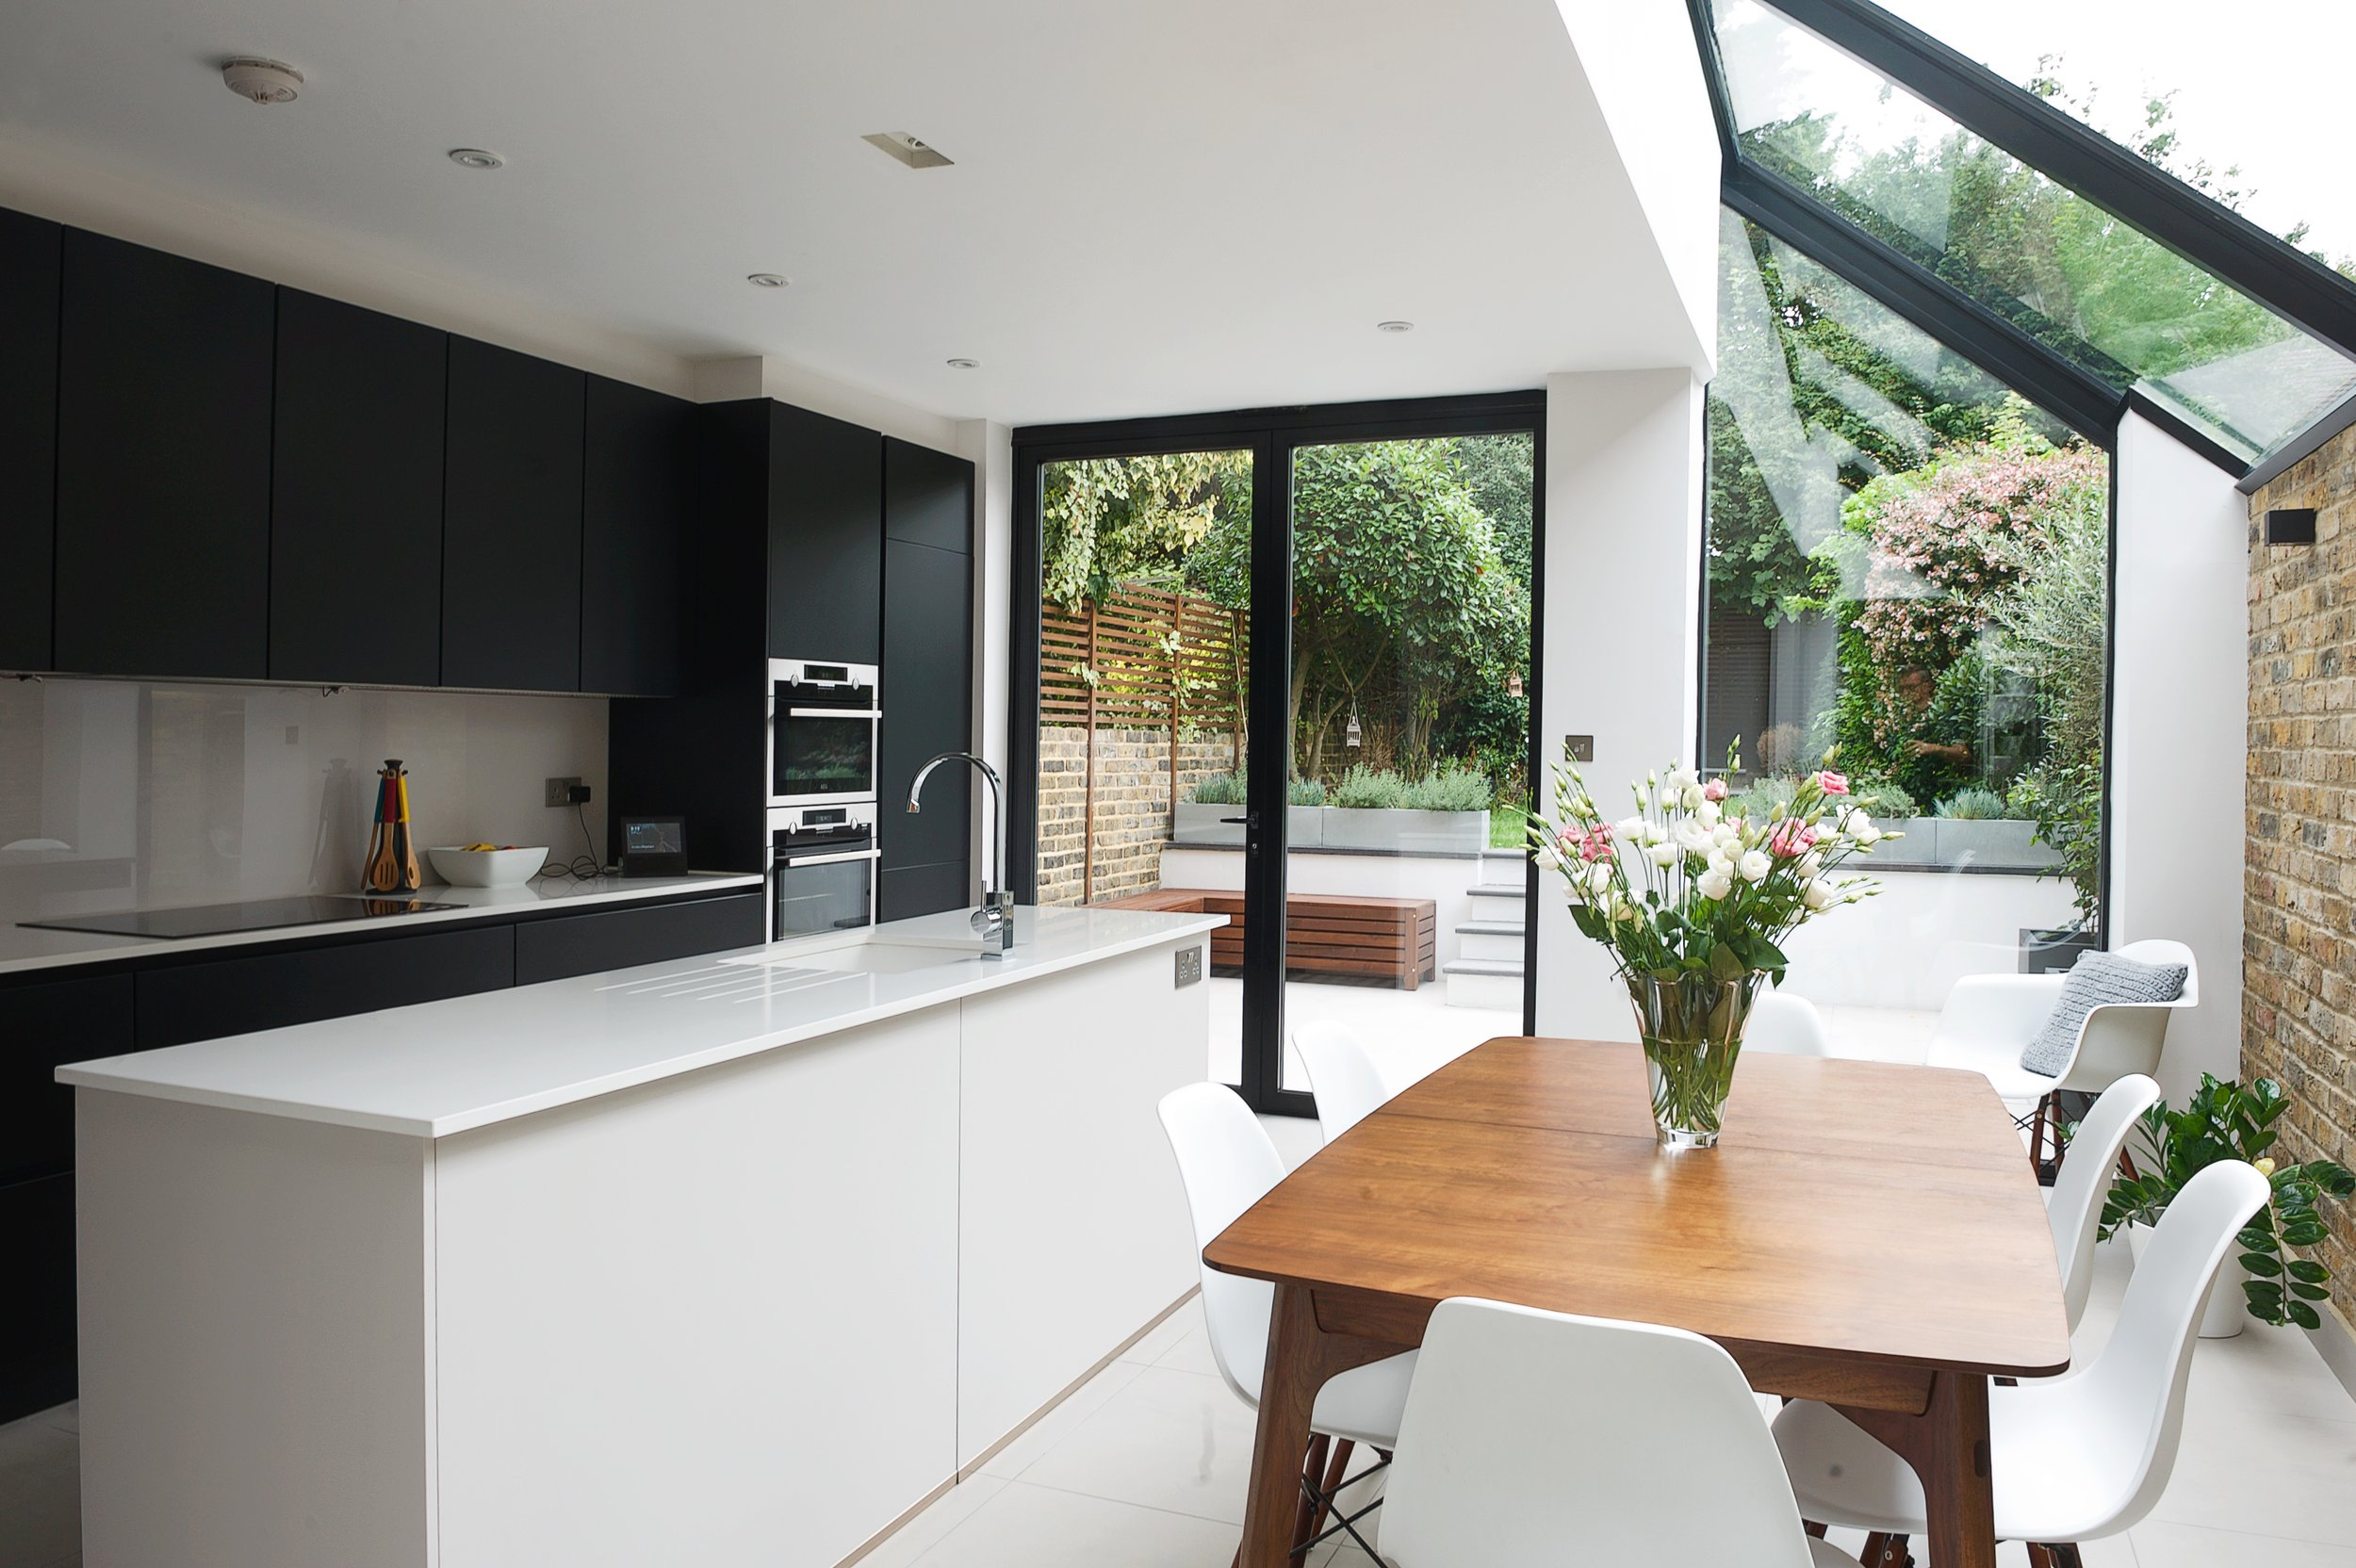 swallowfield-road-kitchen-1.jpg